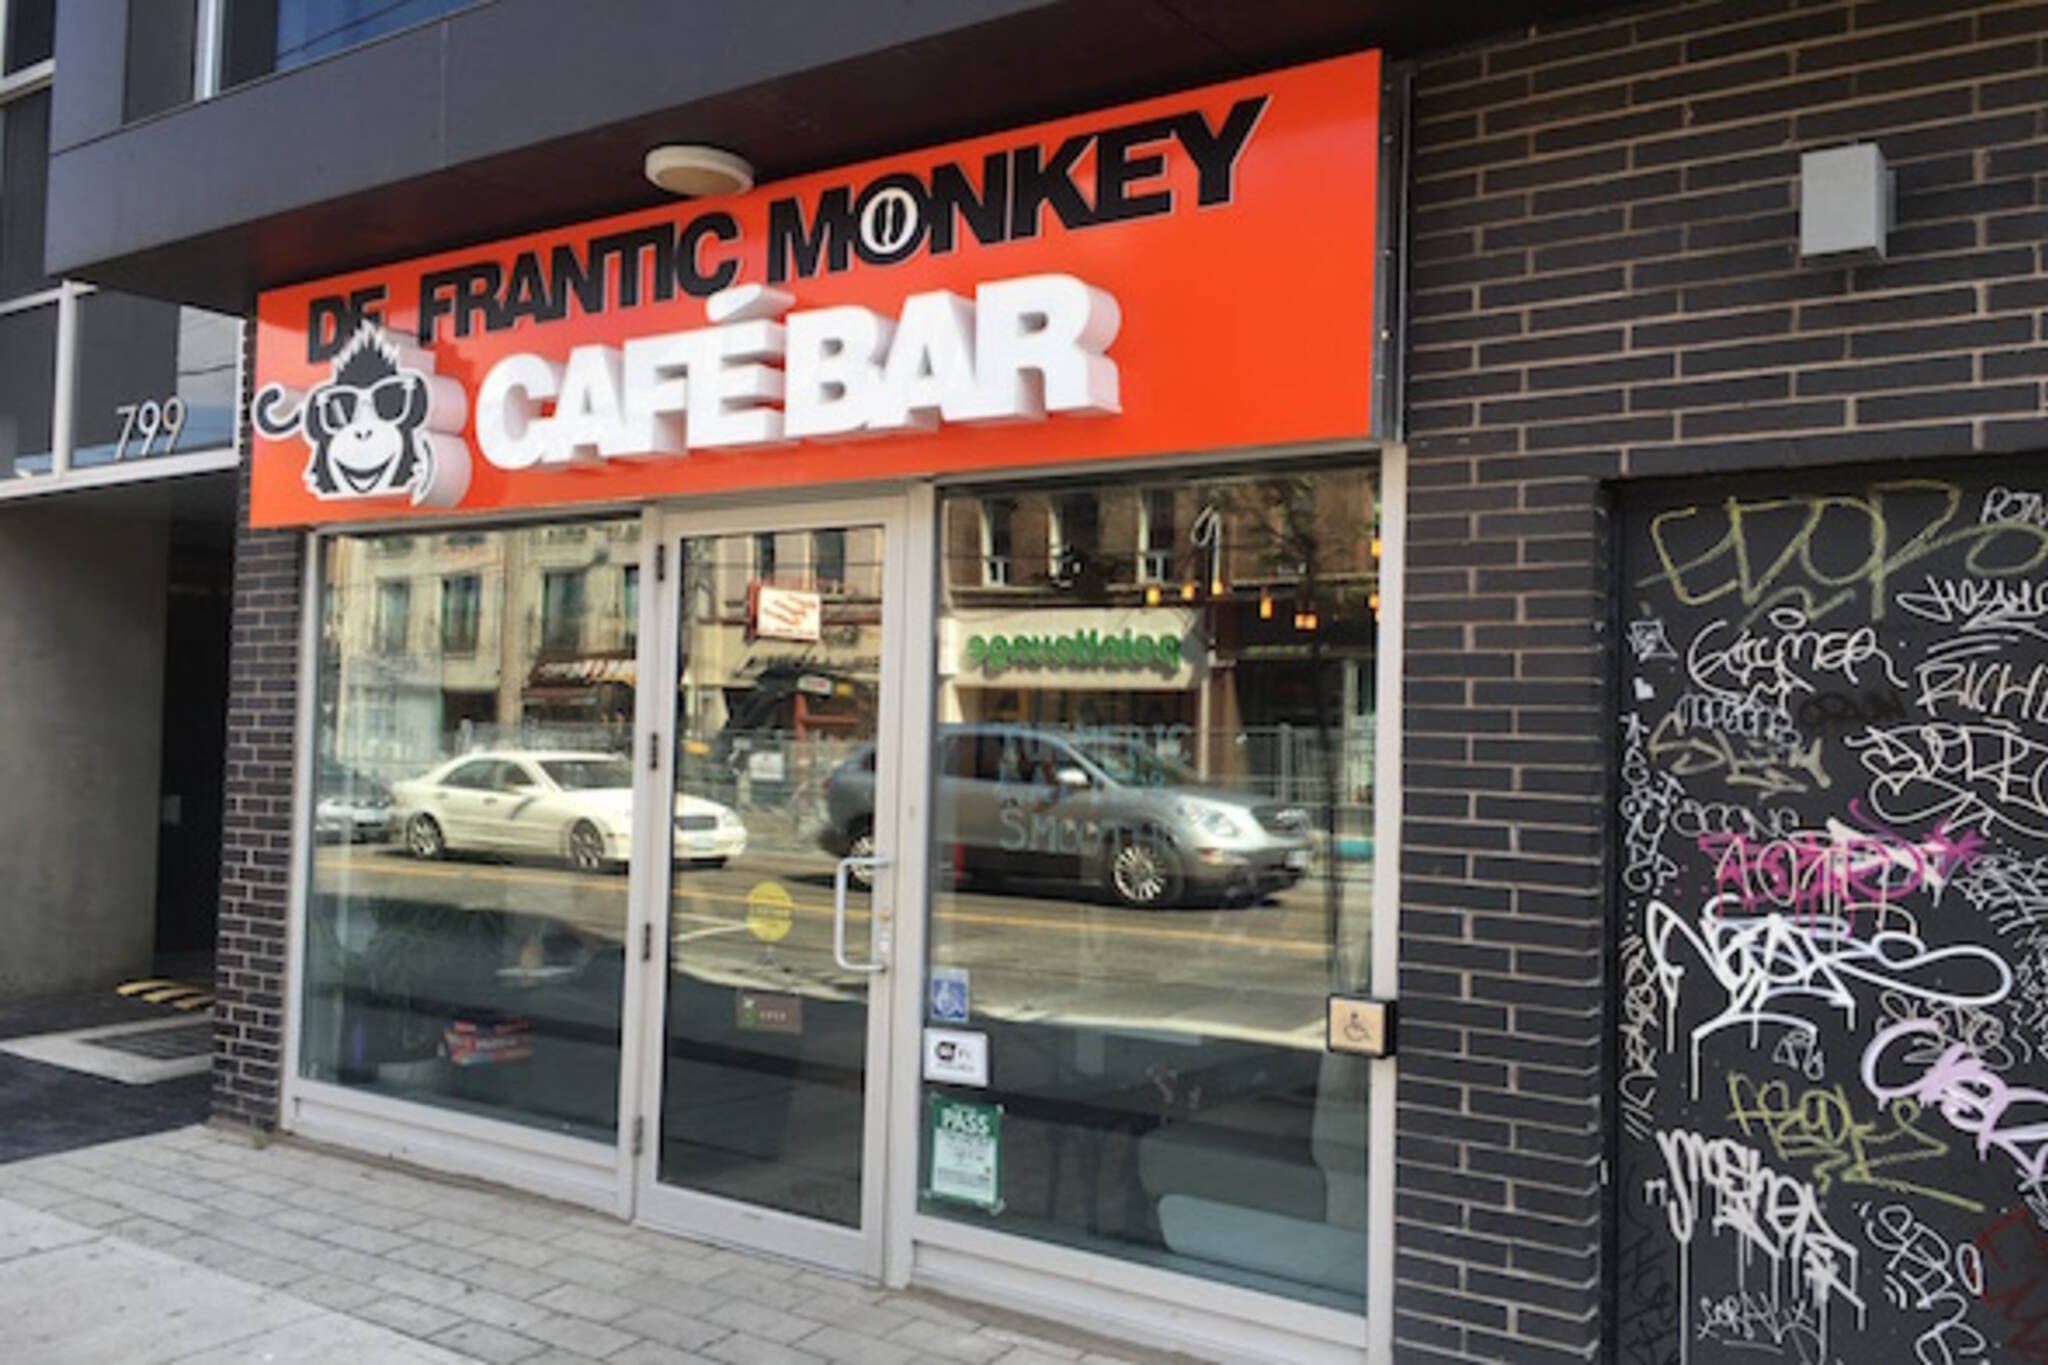 De Frantic Monkey Cafe Bar Toronto